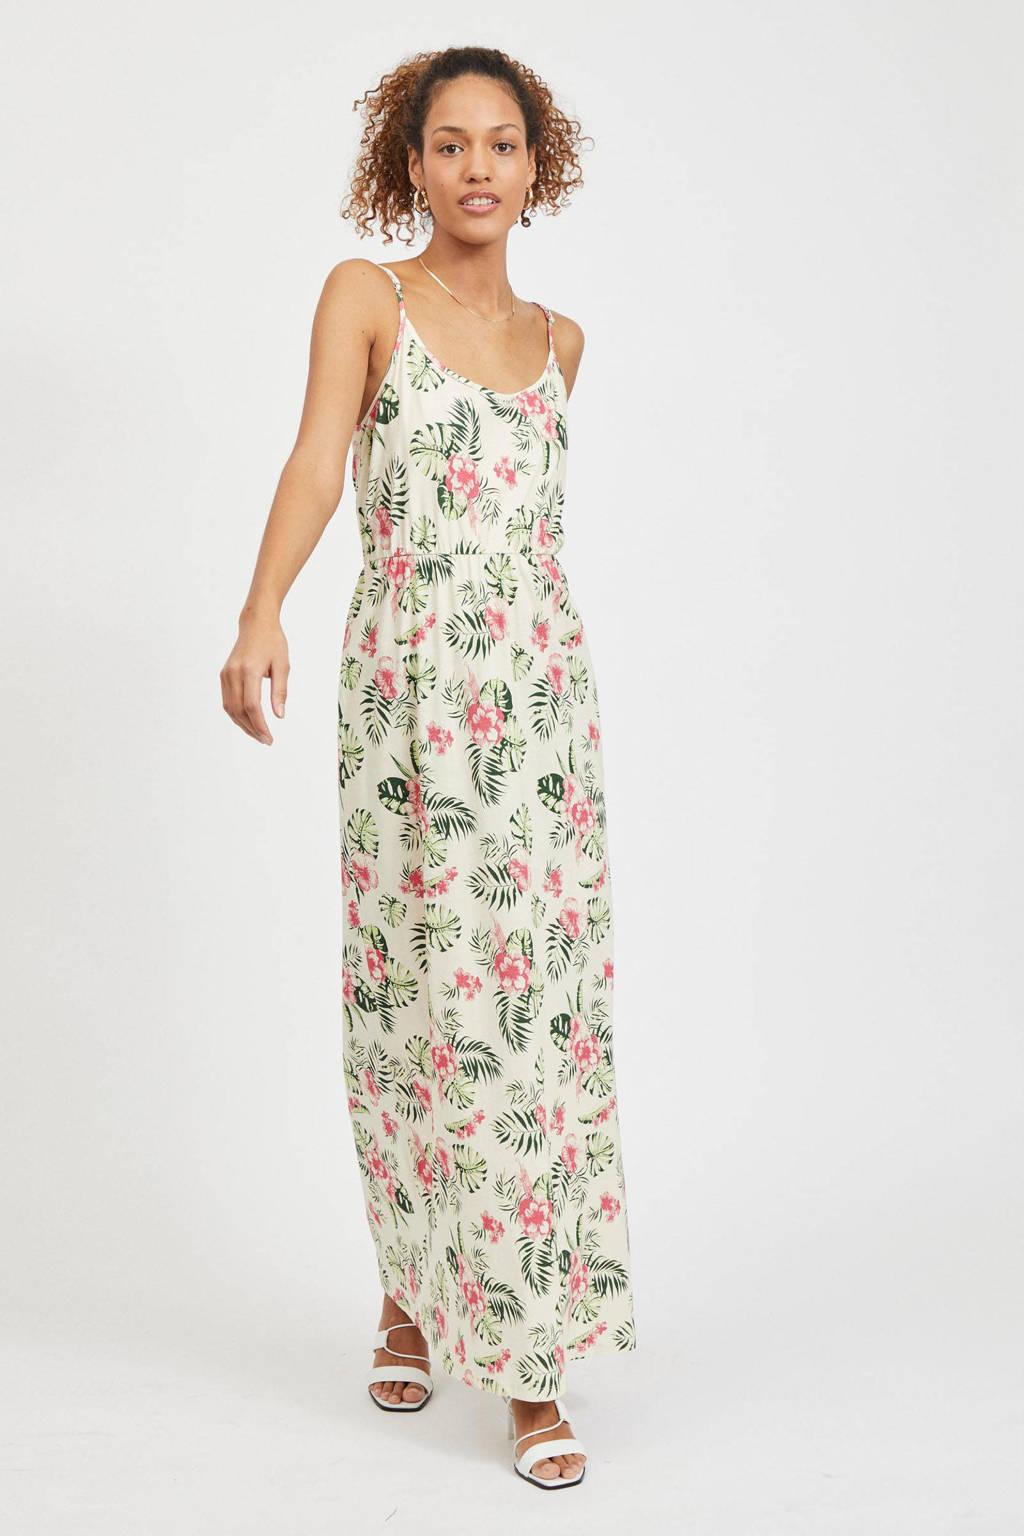 VILA maxi jurk VIPURE met bladprint ecru/groen/roze, Ecru/groen/roze